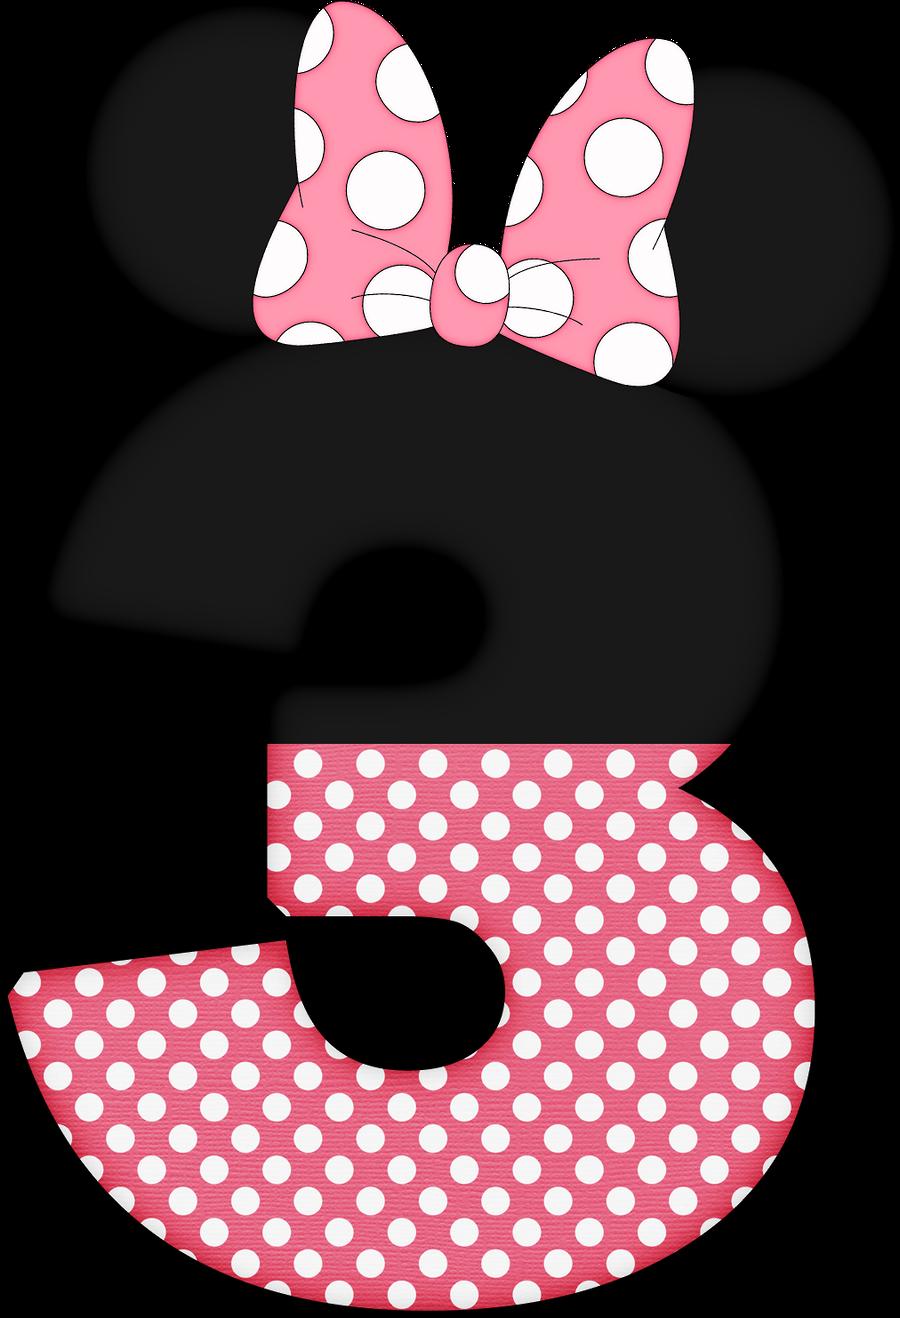 Si Ratinha Feliz Alpha 30 Png Minnie Mouse Images Minnie Mouse Pink Minnie Mouse Clipart